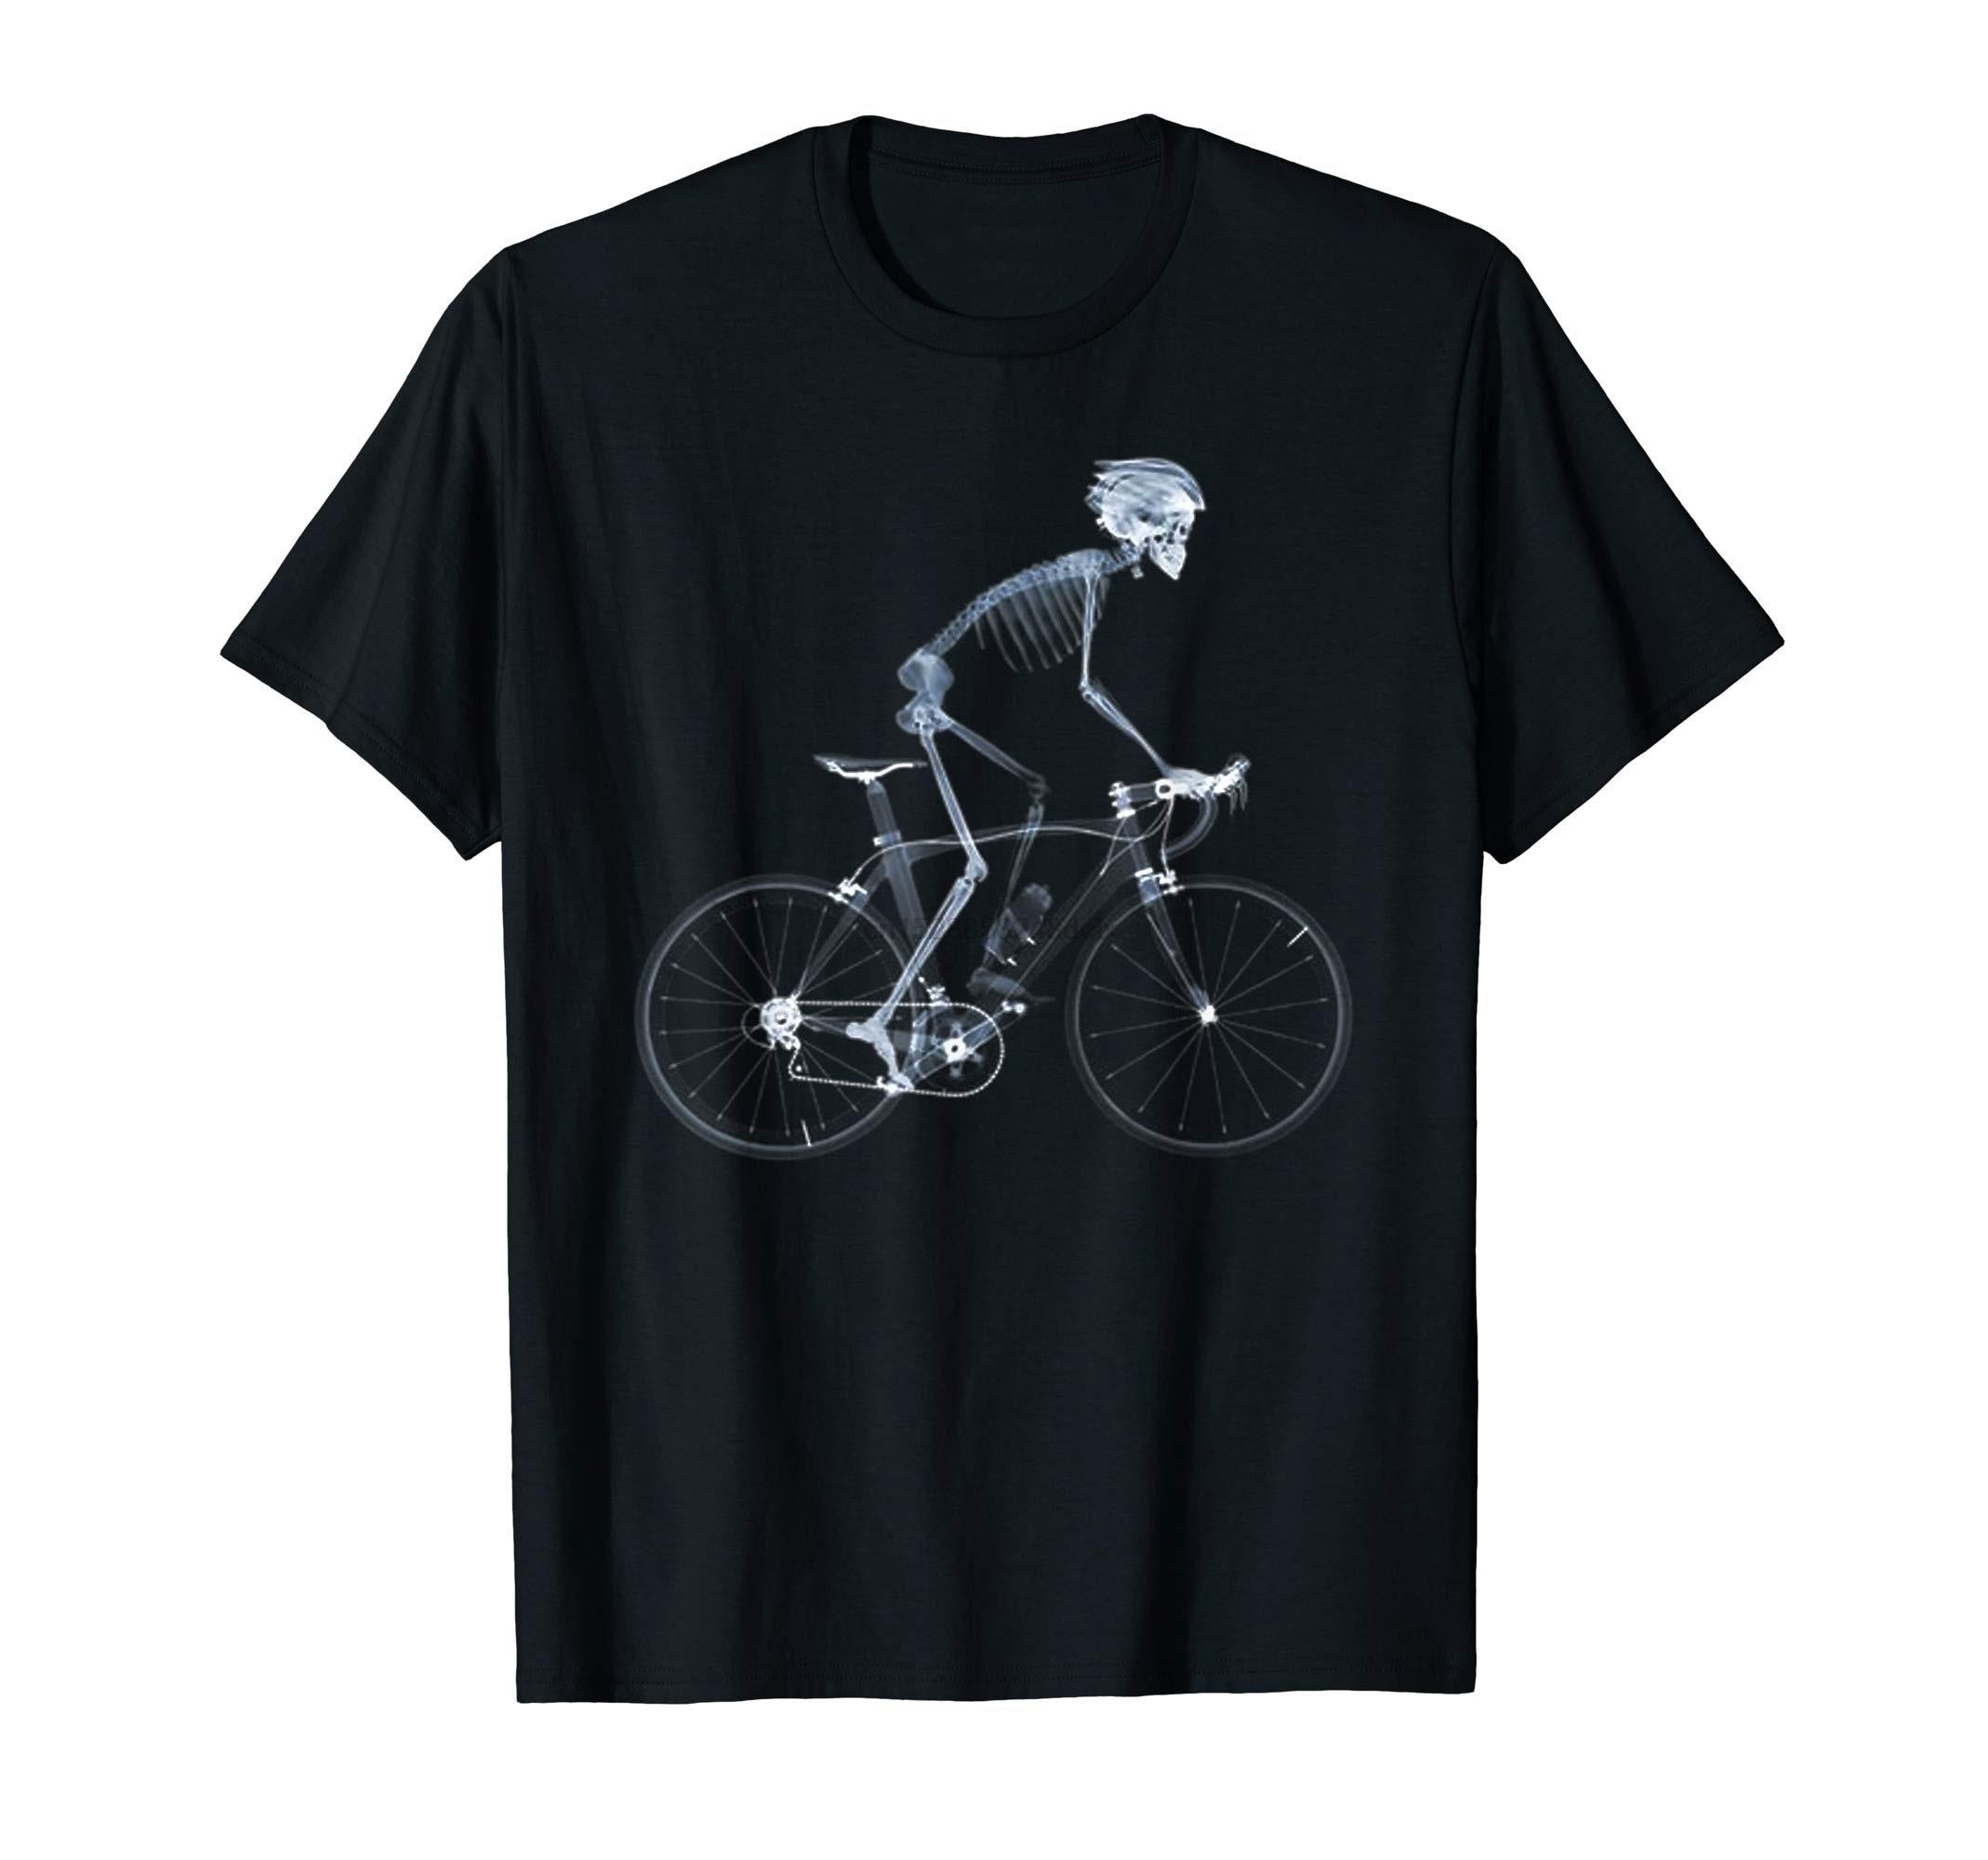 Bicicleta camiseta ciclo ciclismo-x-ray para a vida presente perfeito